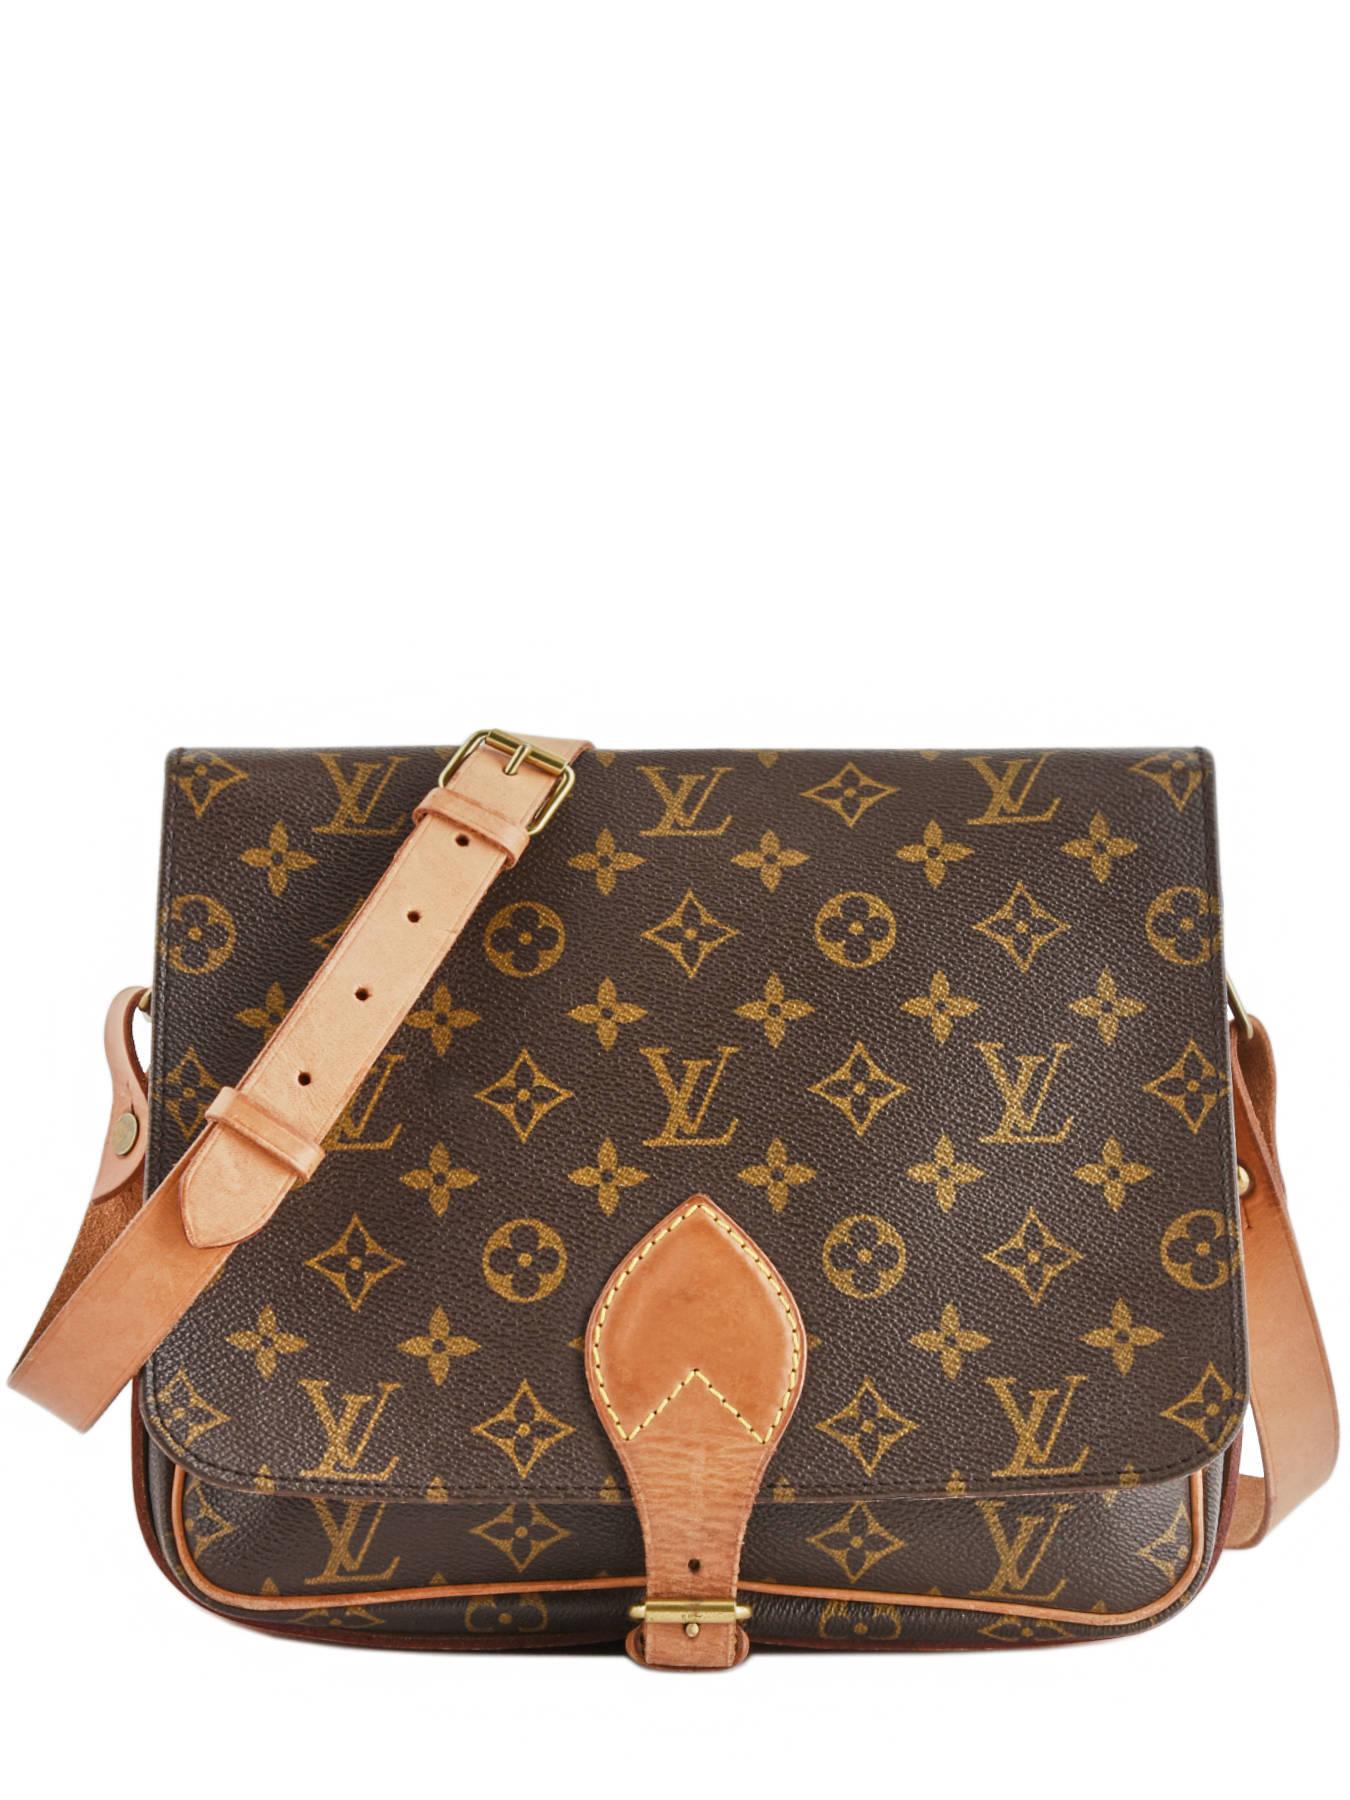 d98f0e3f02ae ... Preloved Louis Vuitton Crossbody Bag Cartouchière Monogram Brand  connection Brown louis vuitton - 00000043 ...